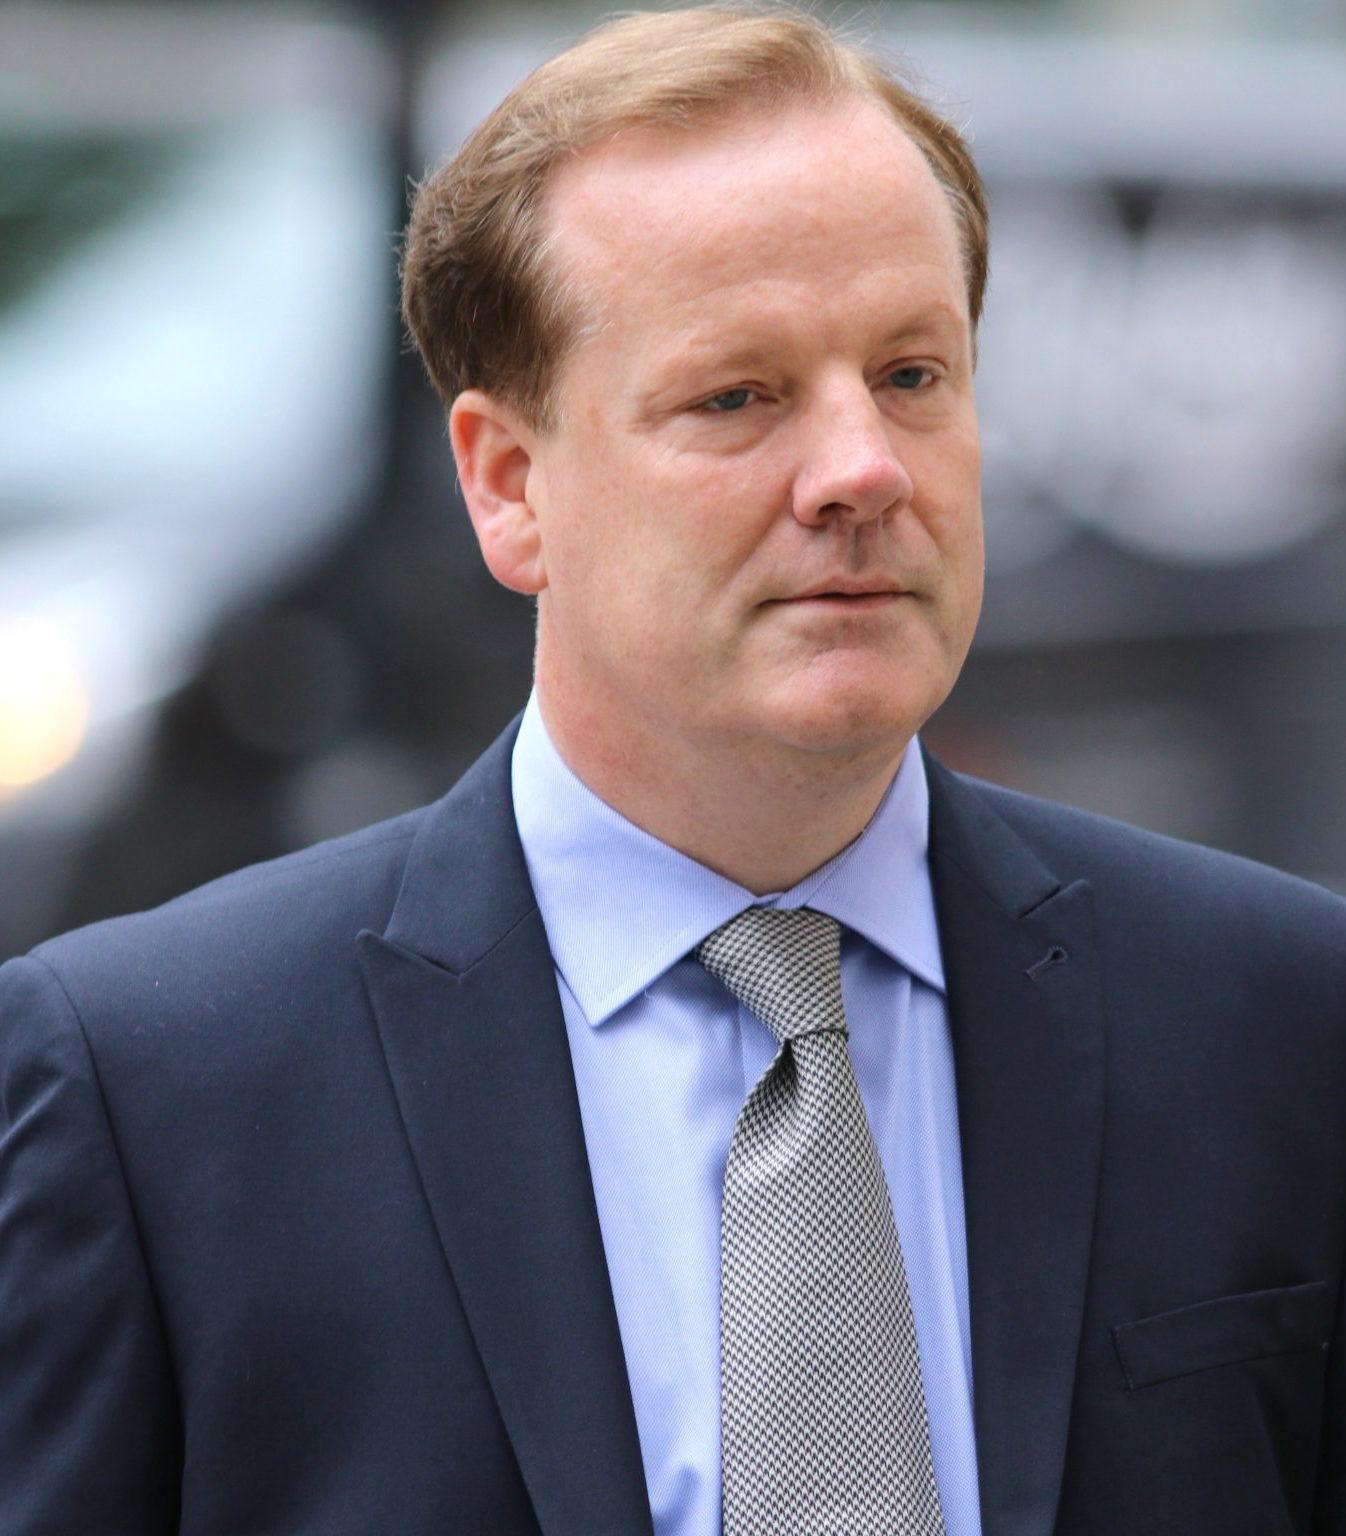 Parliamentary staffer was 'broken' after alleged gropes